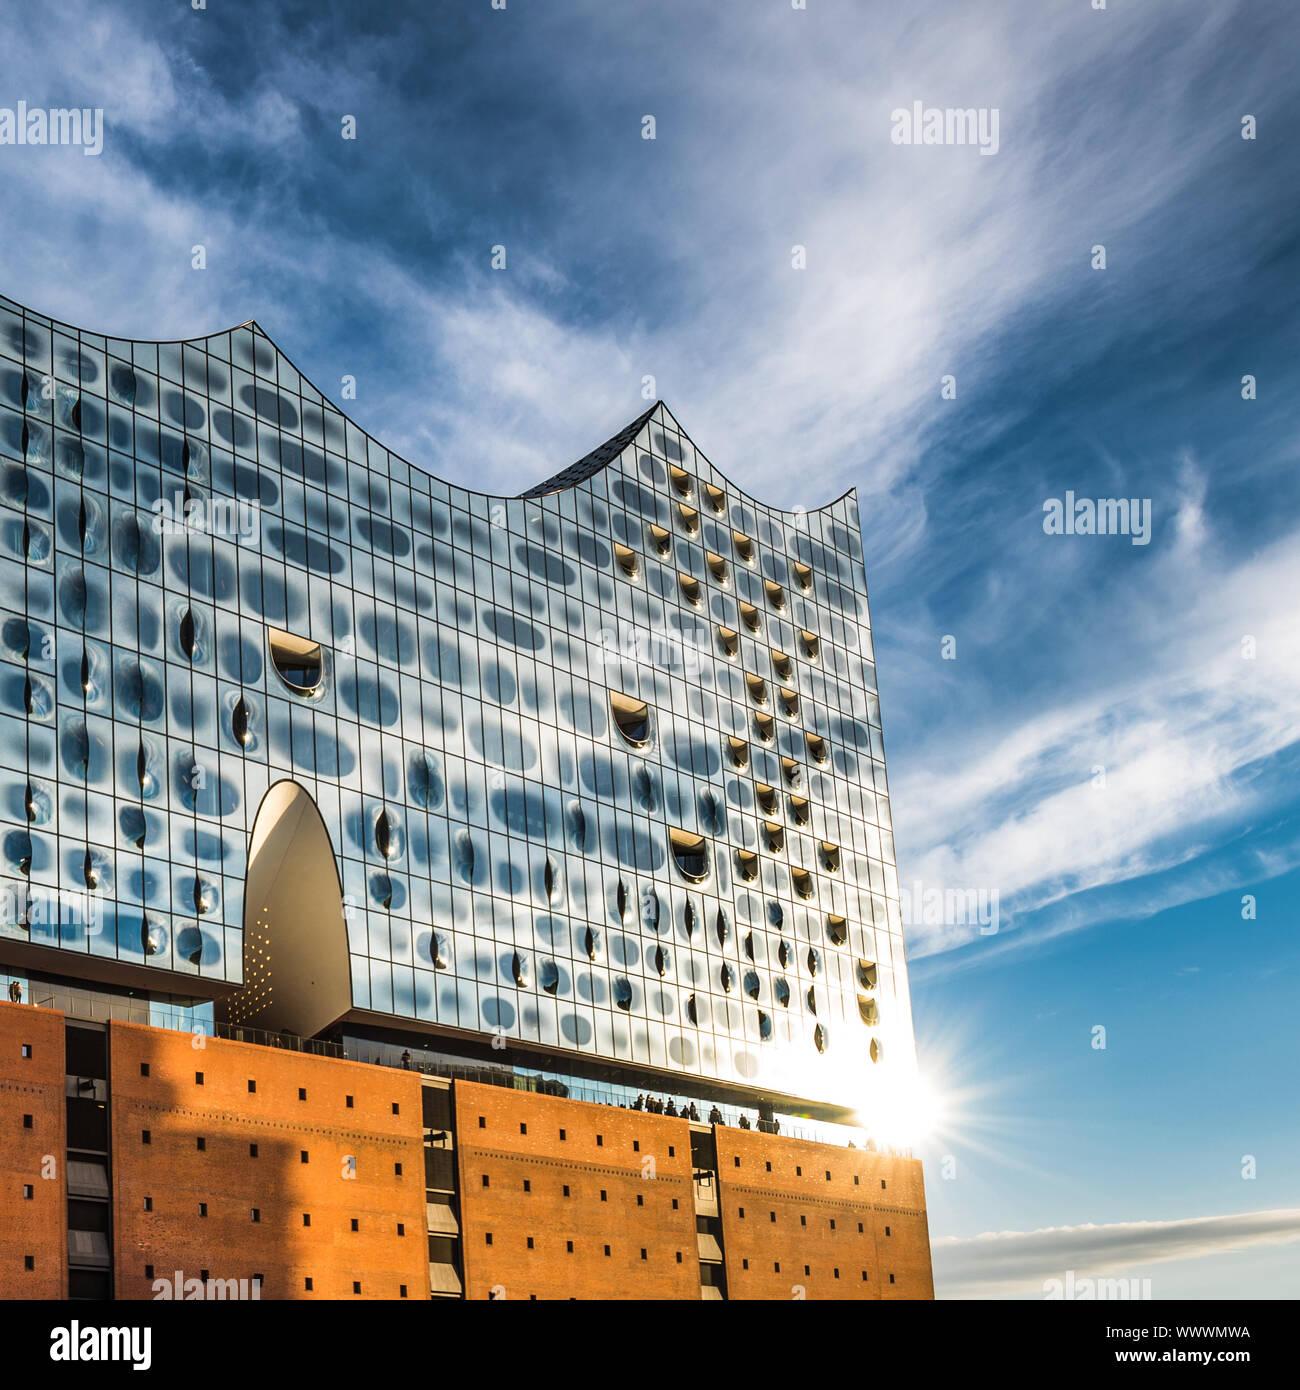 The Elbe Philharmonic Hall or Elbphilharmonie, concert hall in the Hafen City quarter of Hamburg, Germany Stock Photo